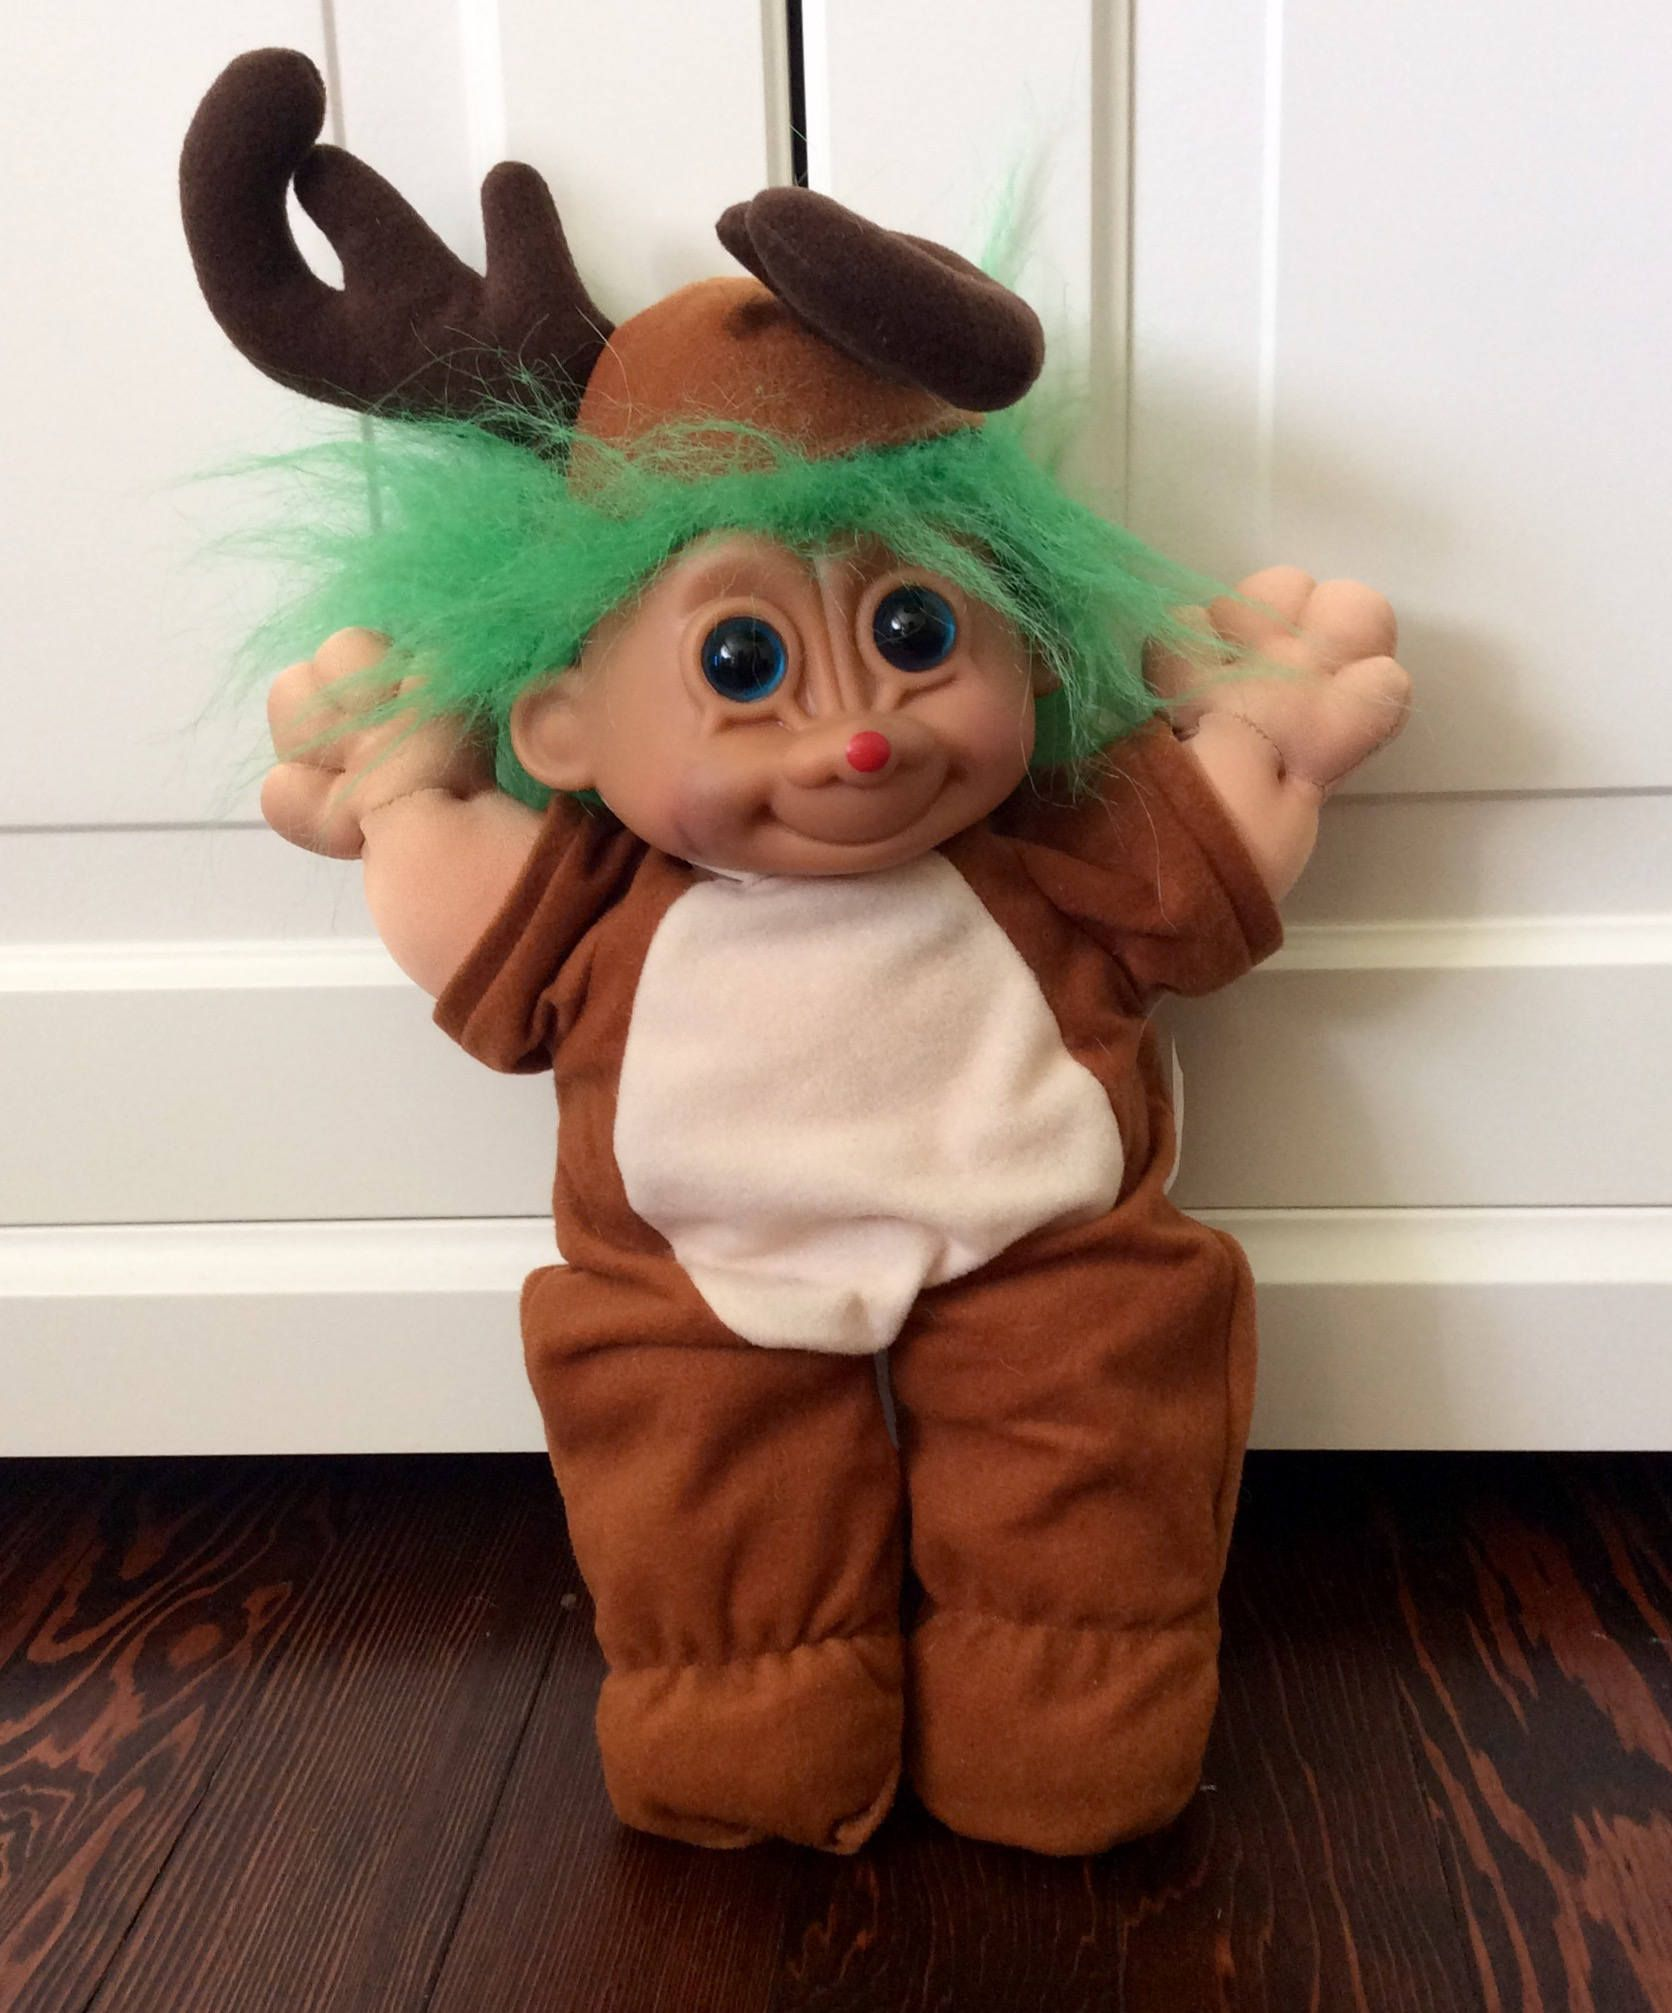 Russ Troll Kidz Plush Raindeer Troll Doll, Deer Troll Doll,